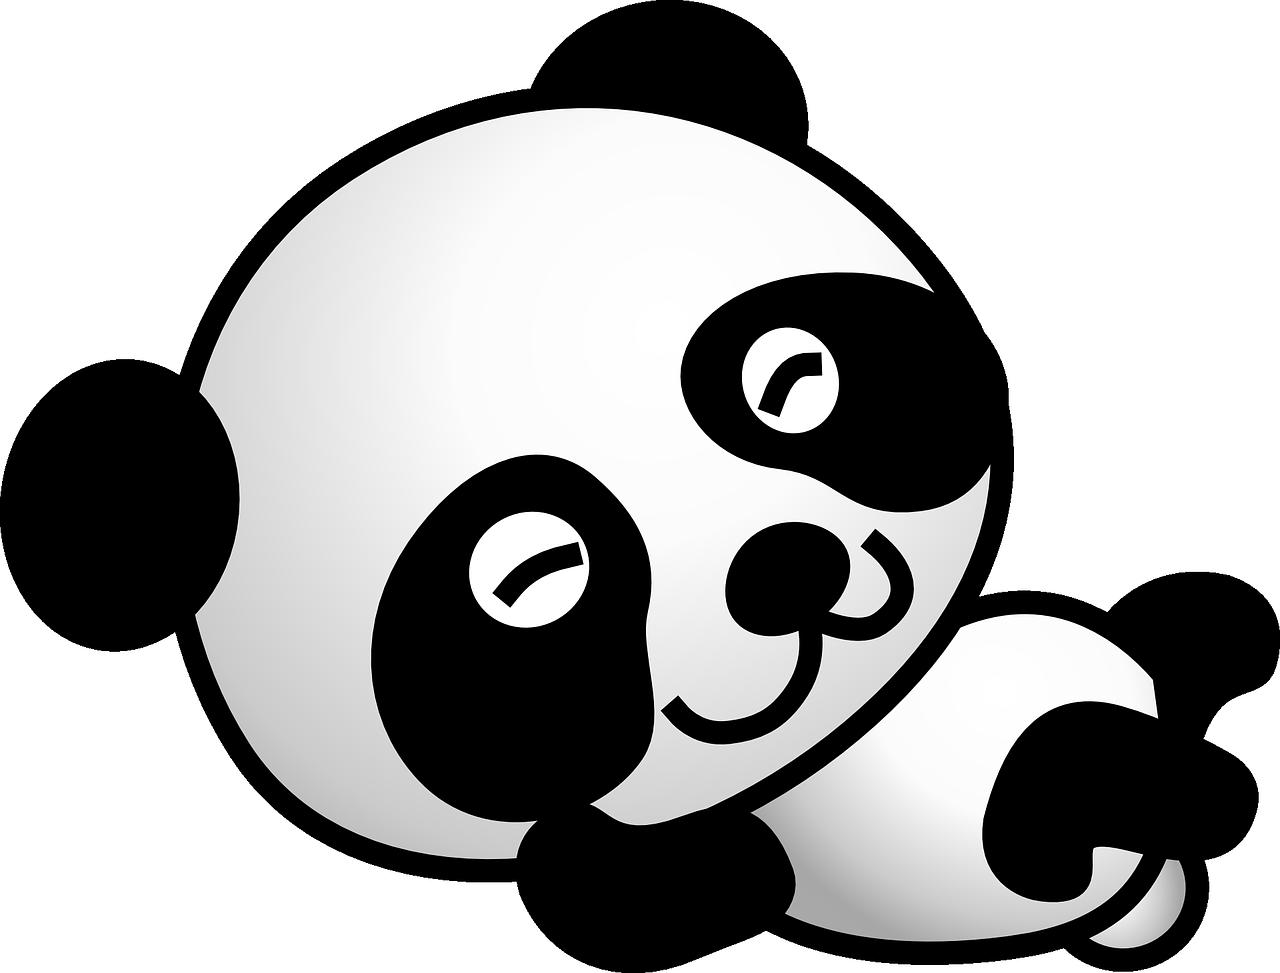 Panda Stickers - 2018 messages sticker-4